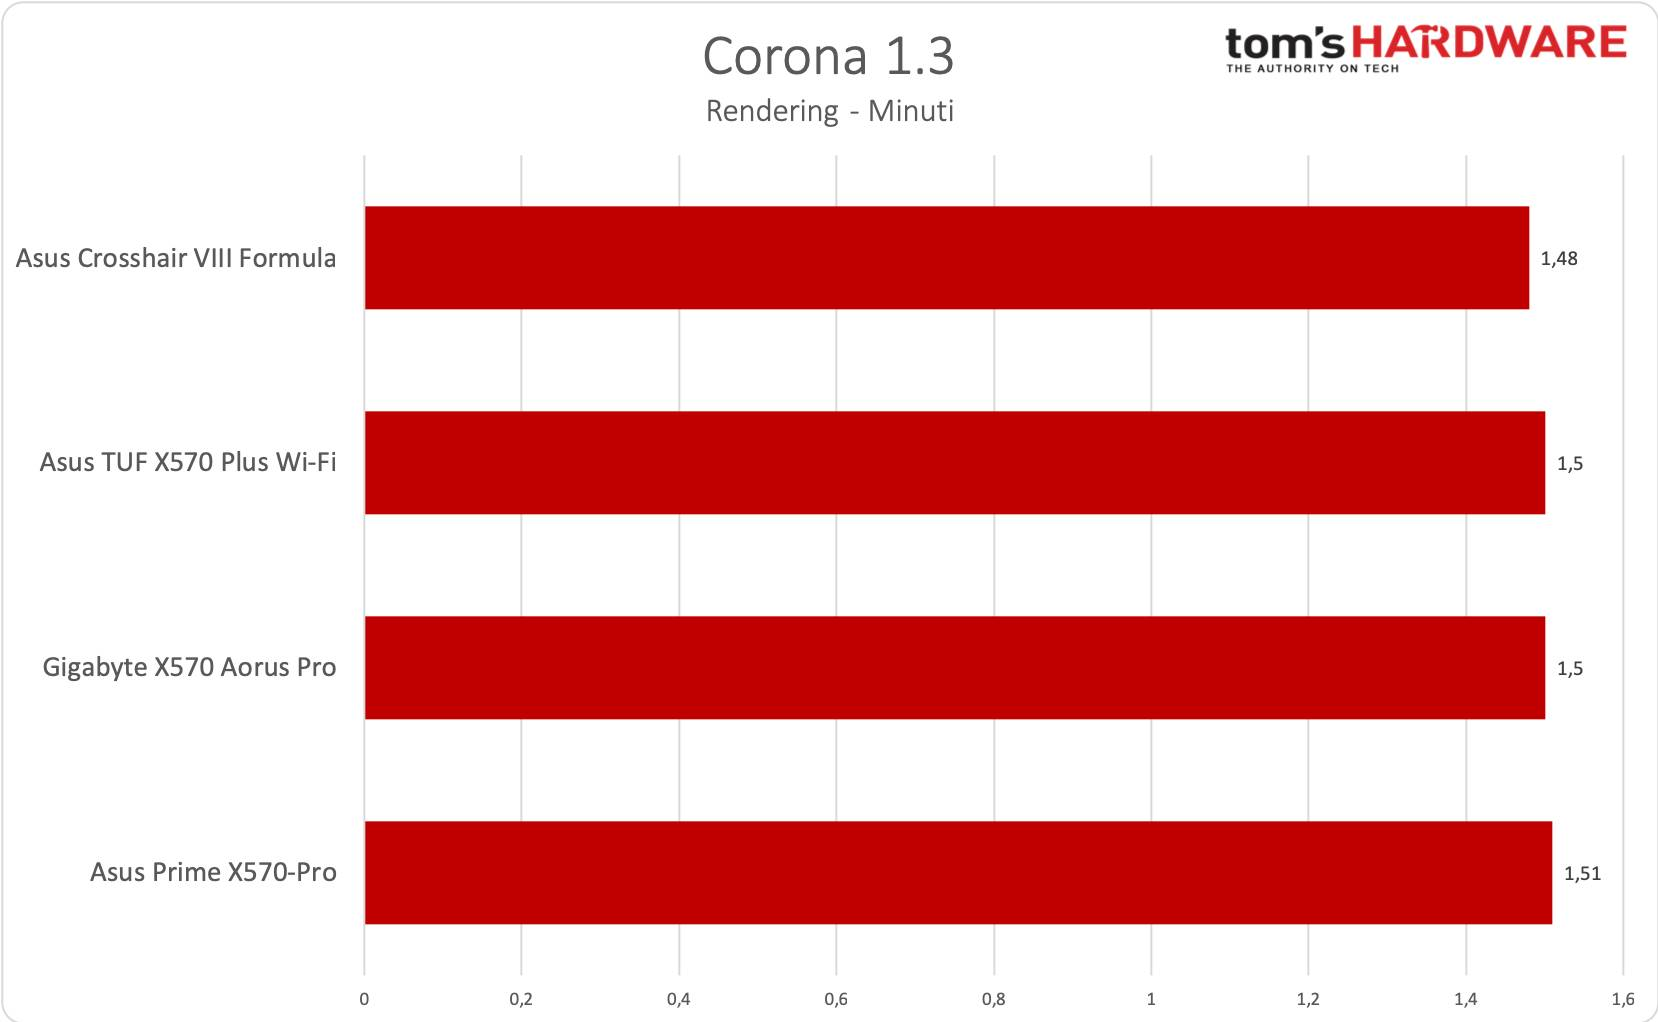 Crosshair VIII Formula - Corona